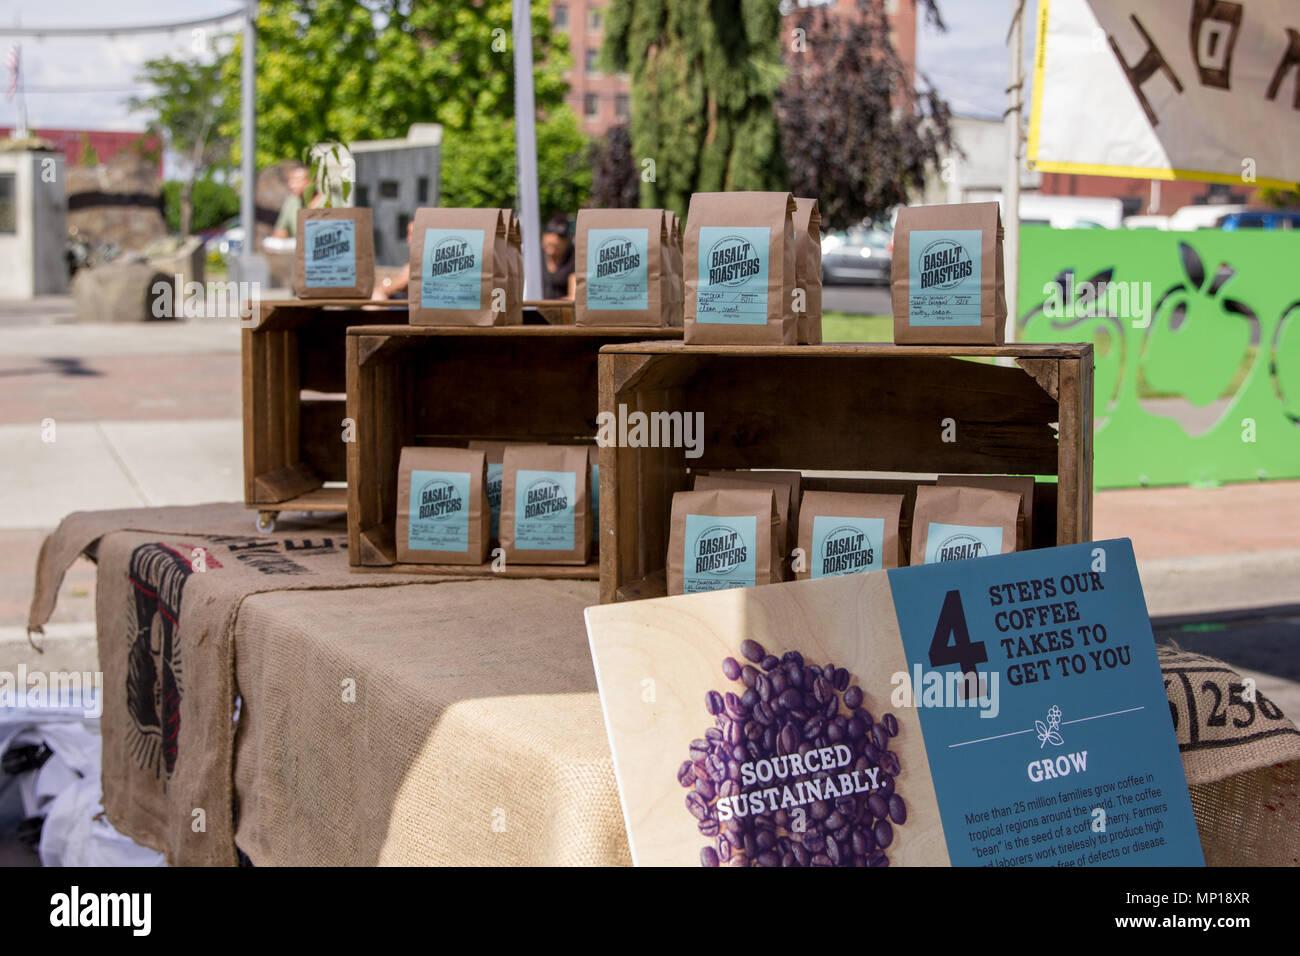 Yakima, Washington / USA - May 21, 2018: Basalt Roasters sell their single origin coffee at the downtown farmer's market on Sunday morning. - Stock Image